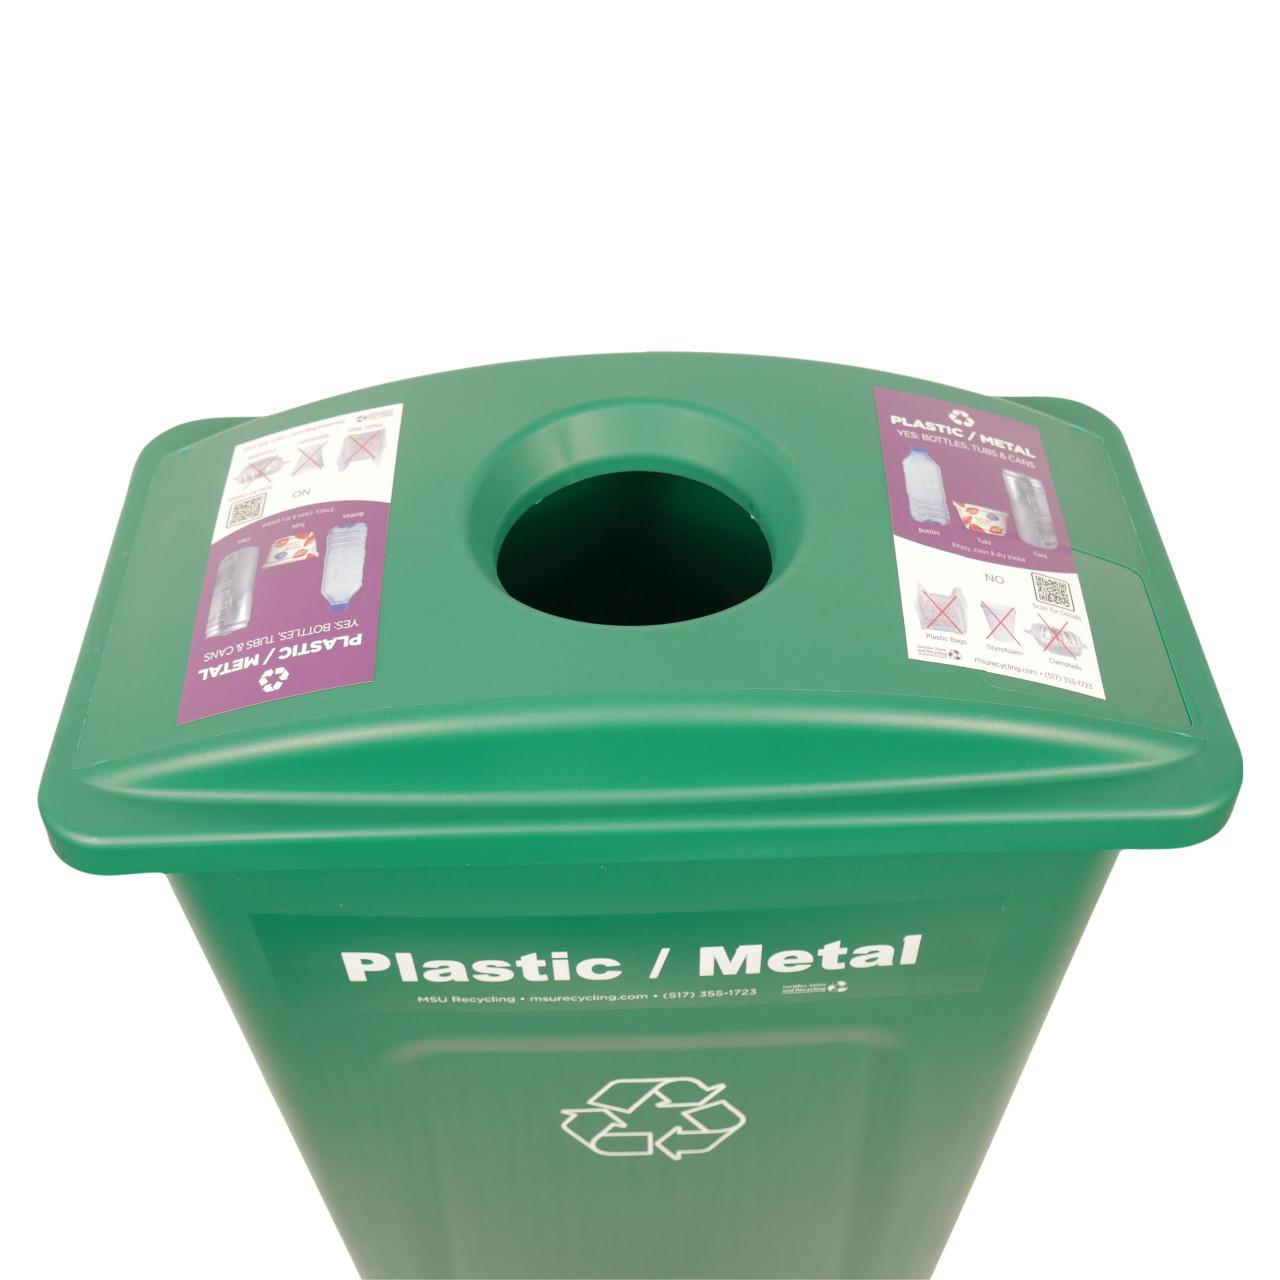 Hallway Recycling Bin for Plastic/Metal - top view